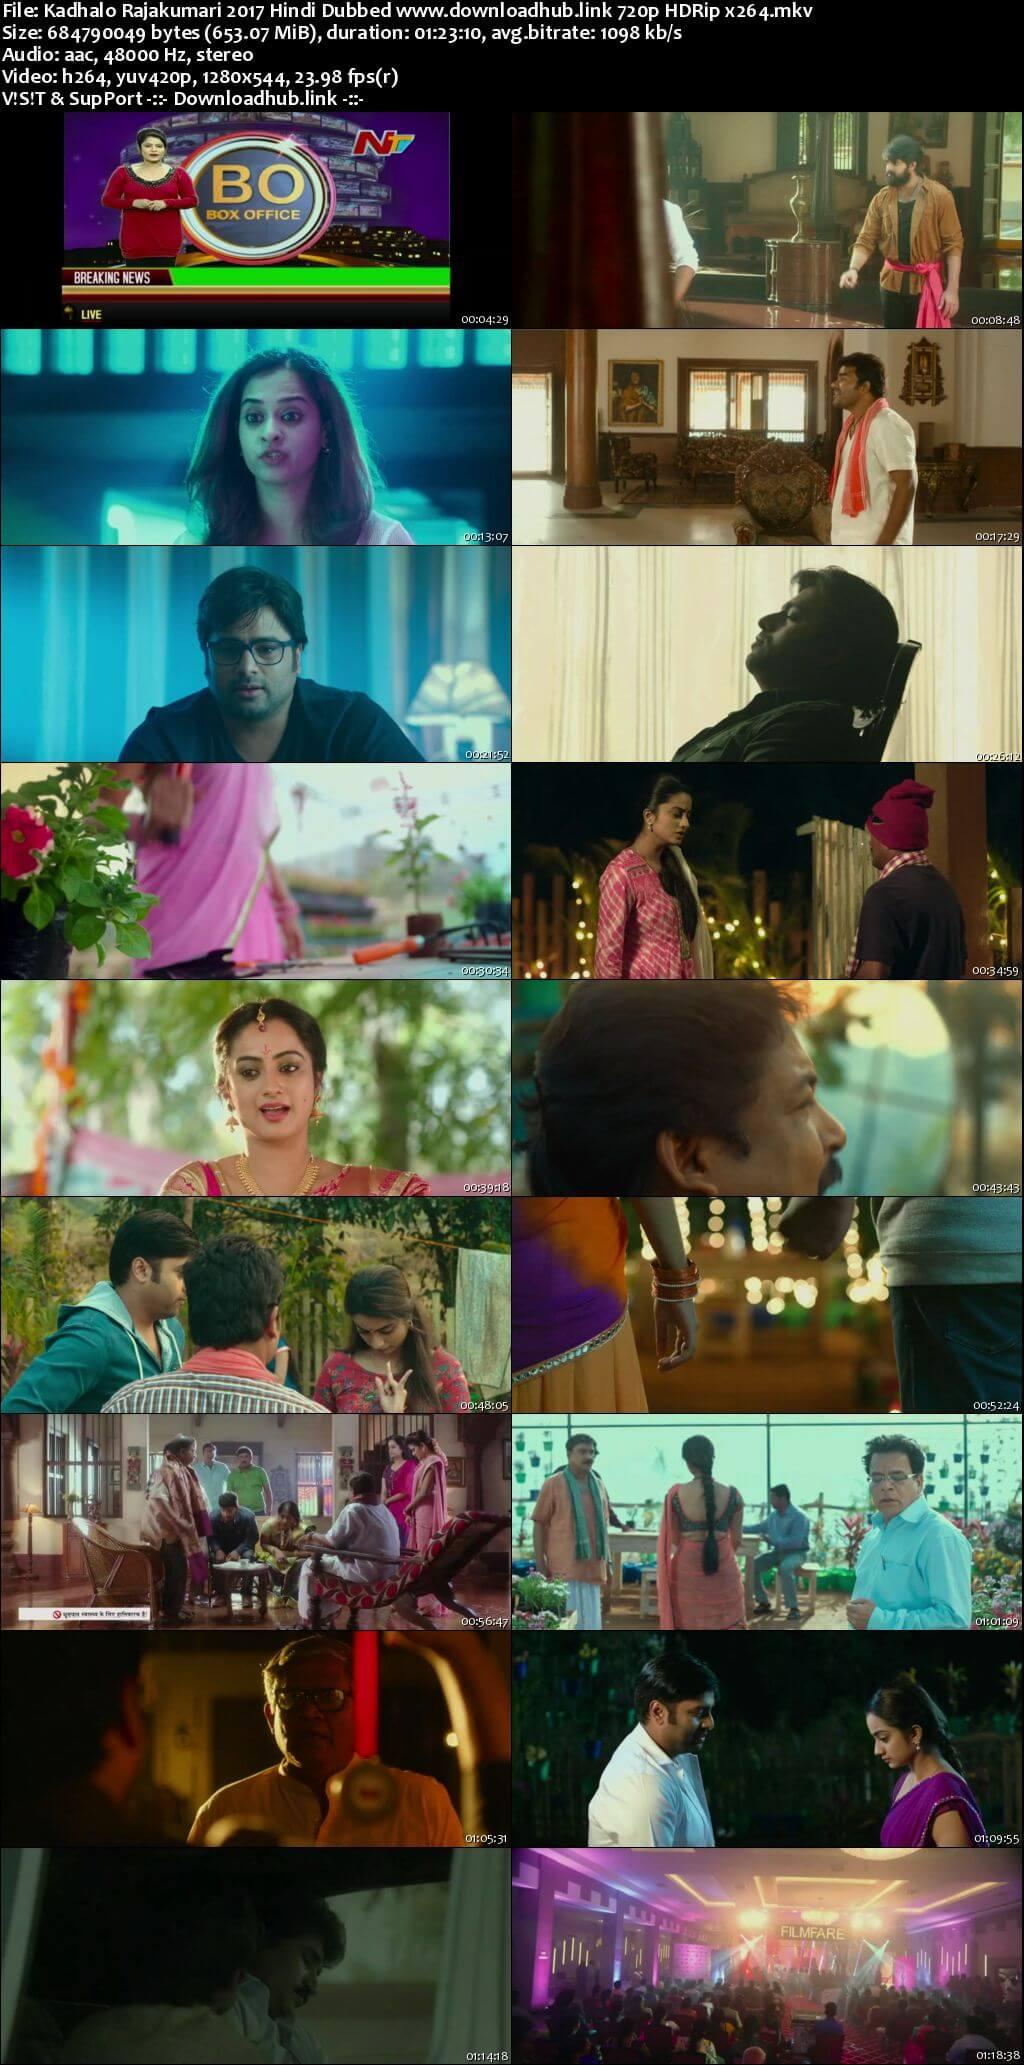 Kadhalo Rajakumari 2017 Hindi Dubbed 720p HDRip x264